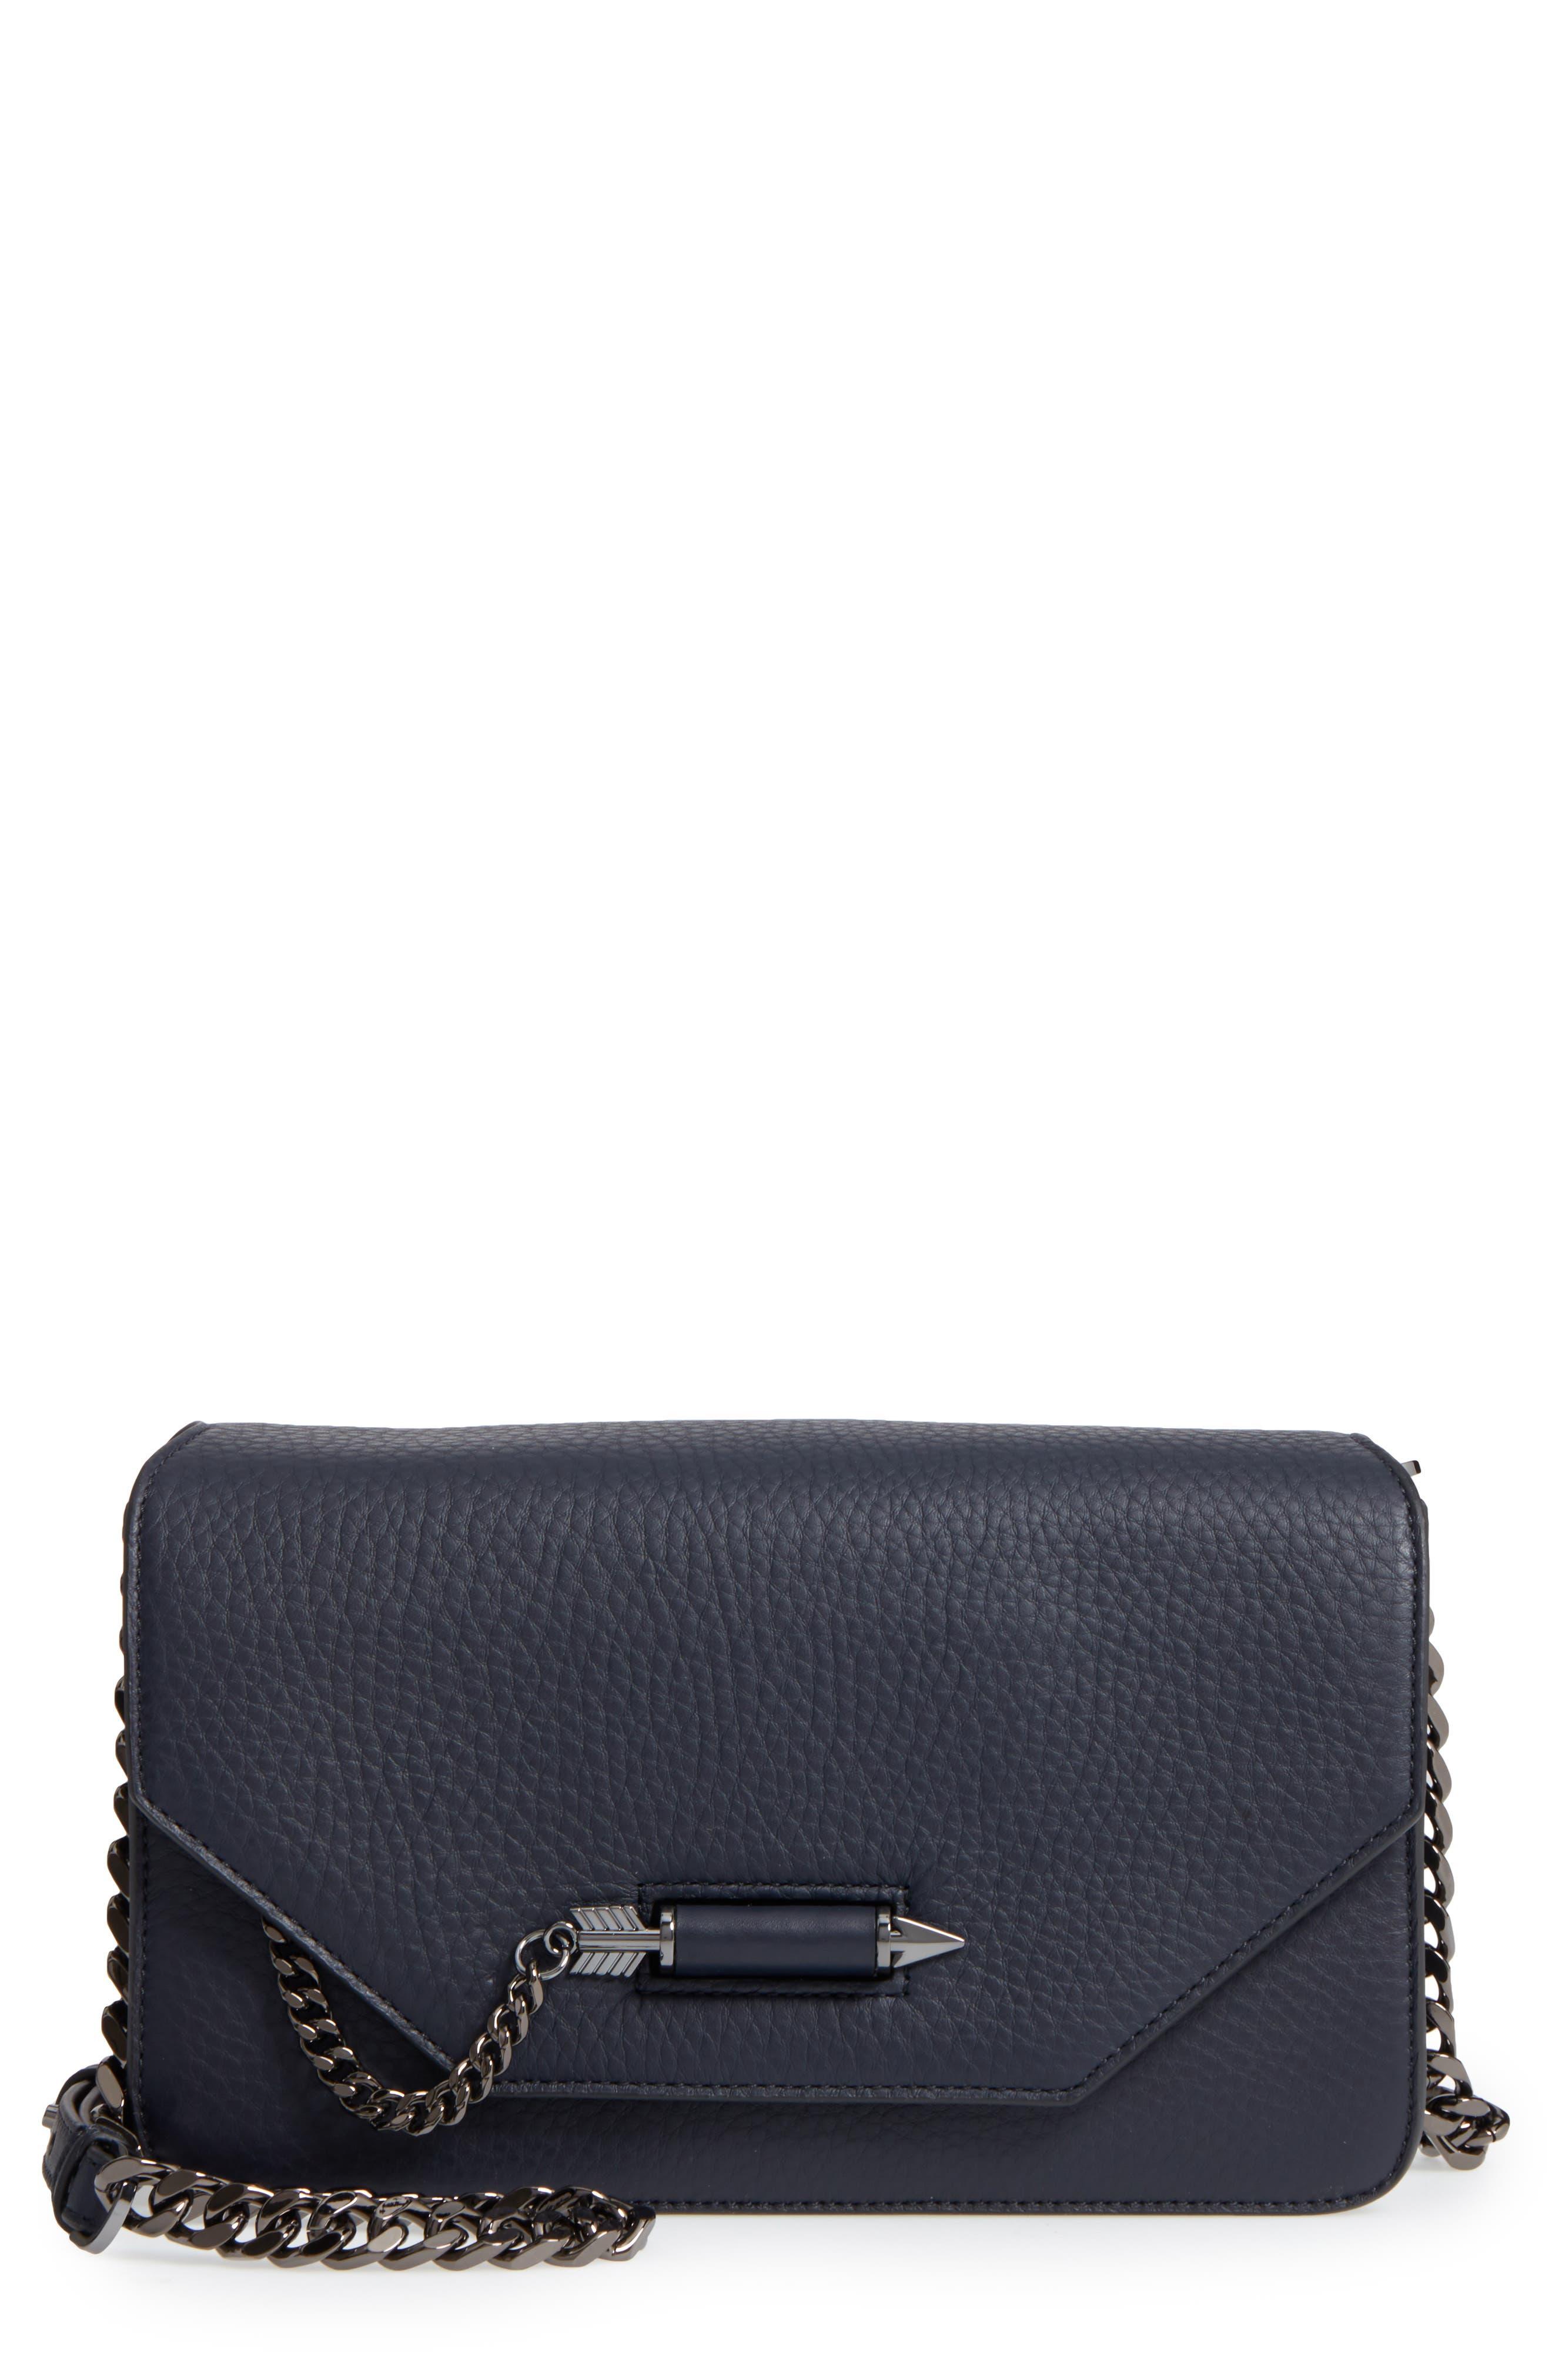 Cortney Nappa Leather Shoulder/Crossbody Bag,                             Main thumbnail 4, color,